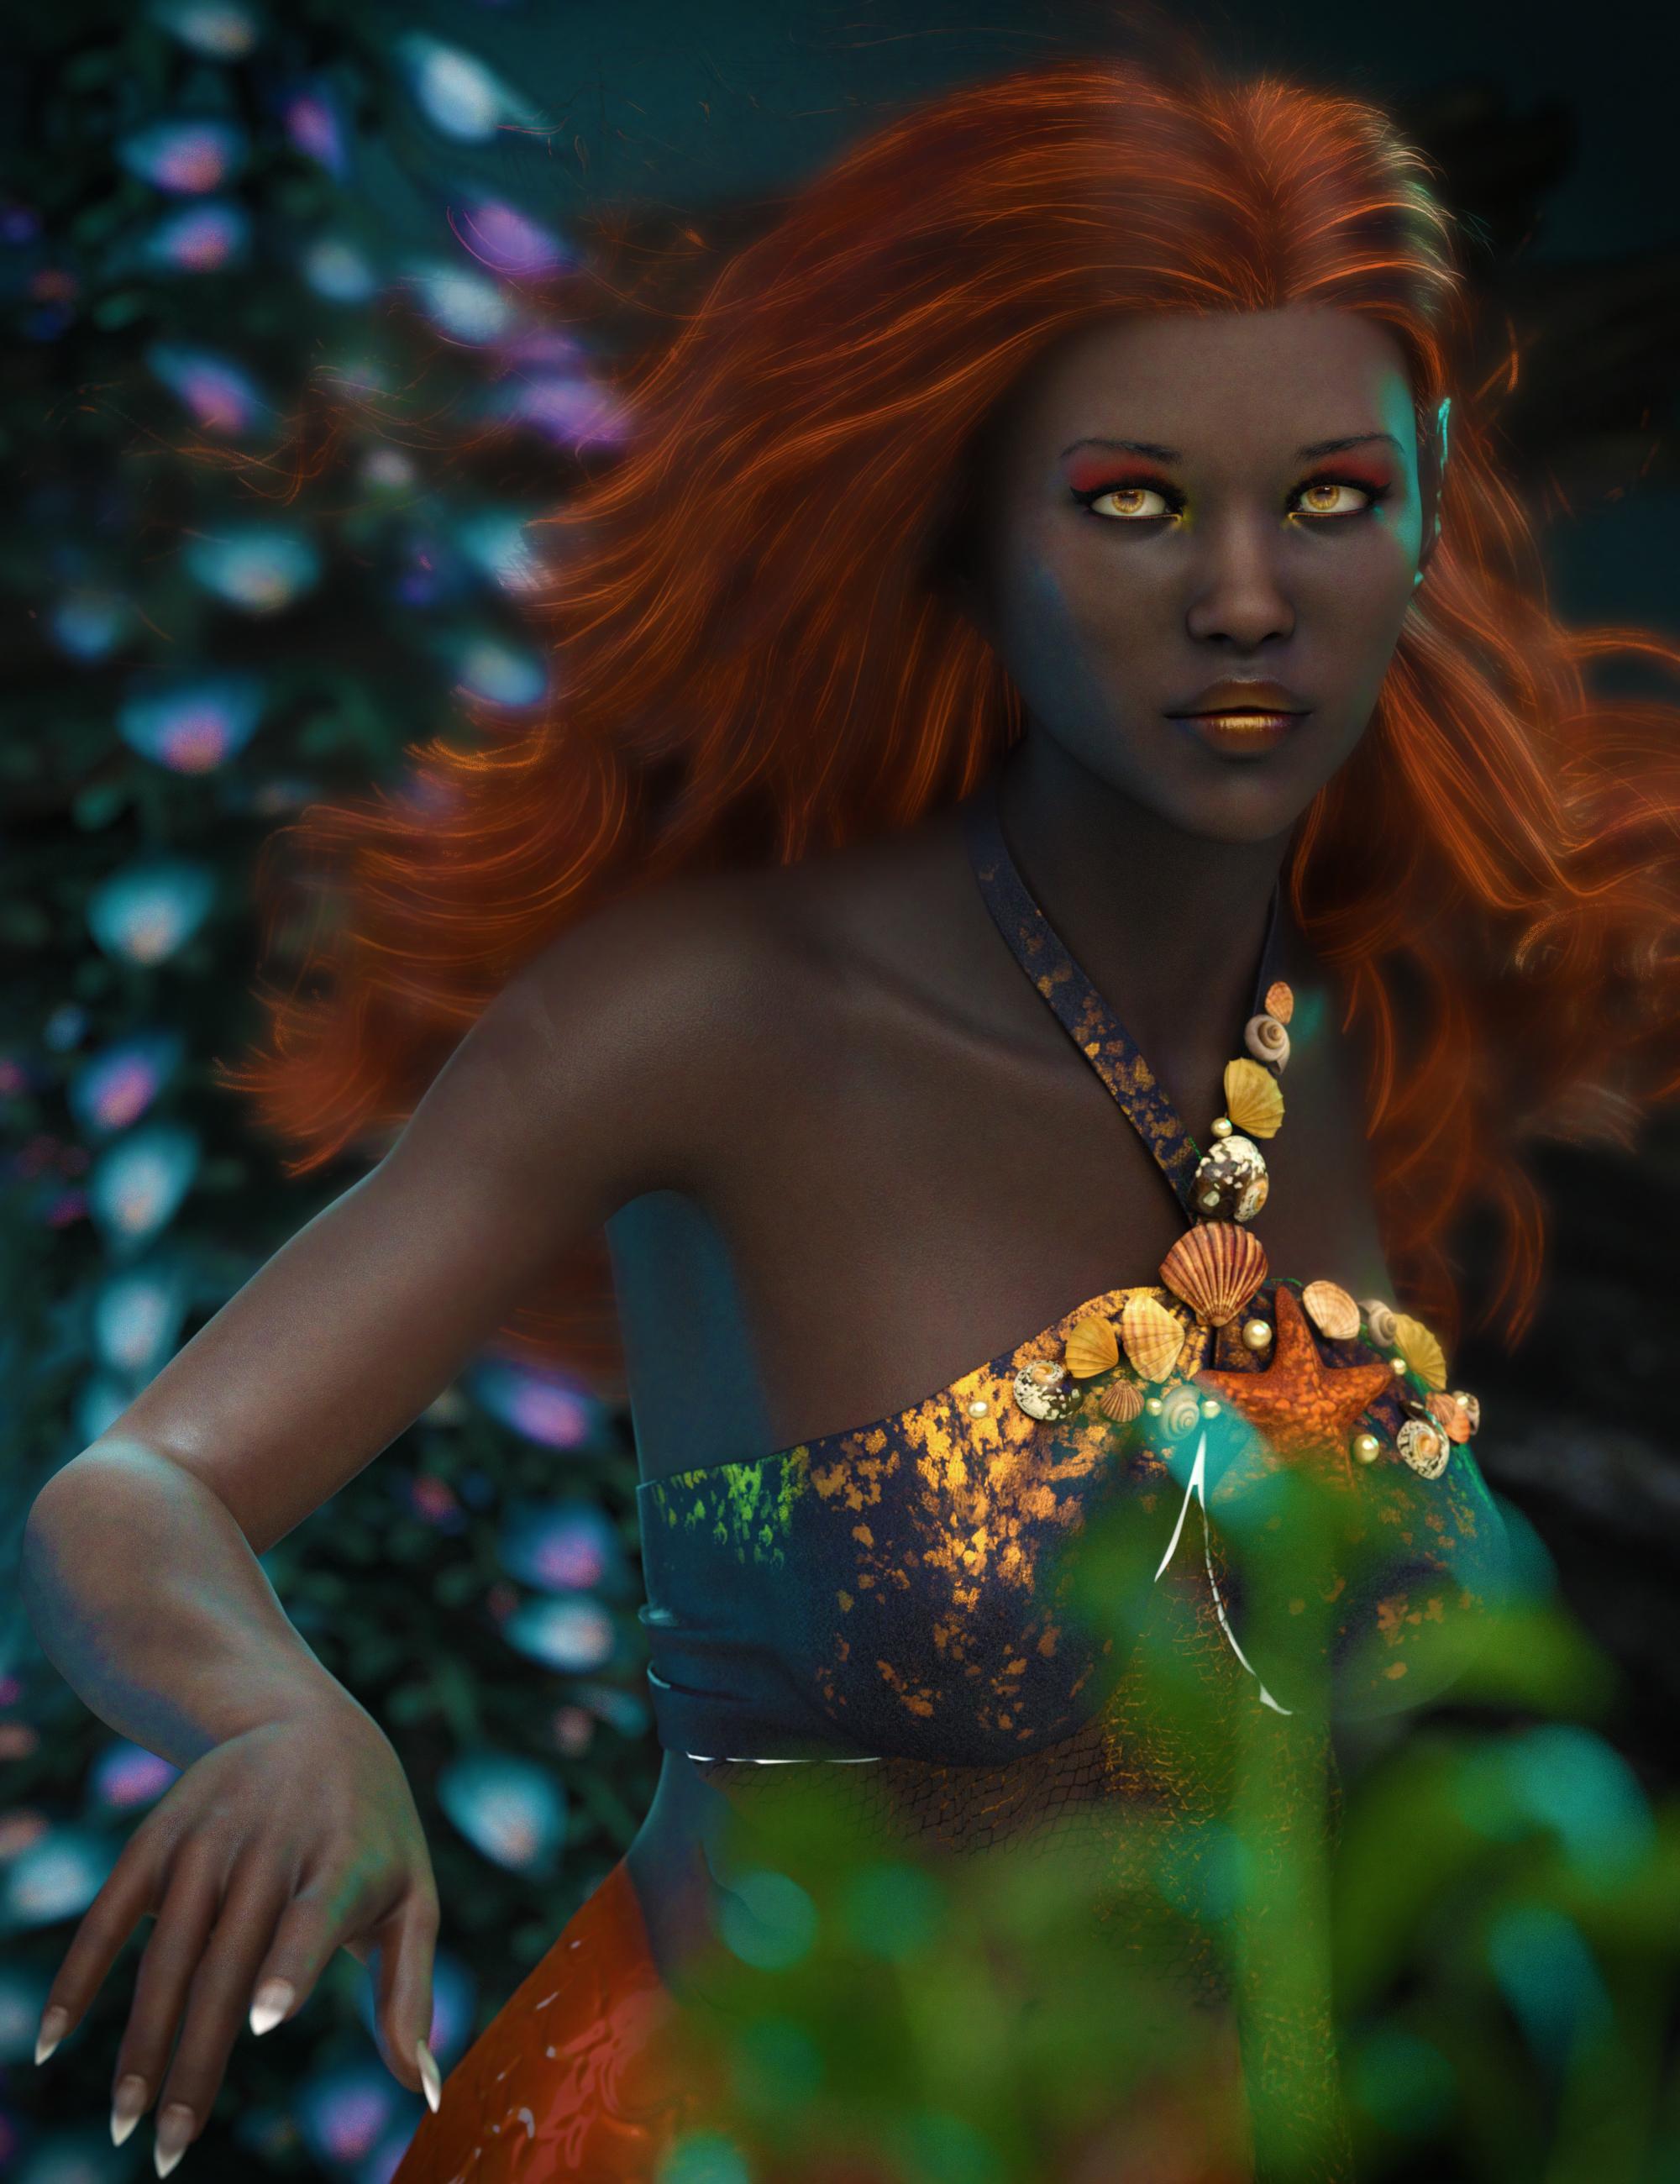 CC Amarine for Genesis 8.1 Female by: ChangelingChick, 3D Models by Daz 3D